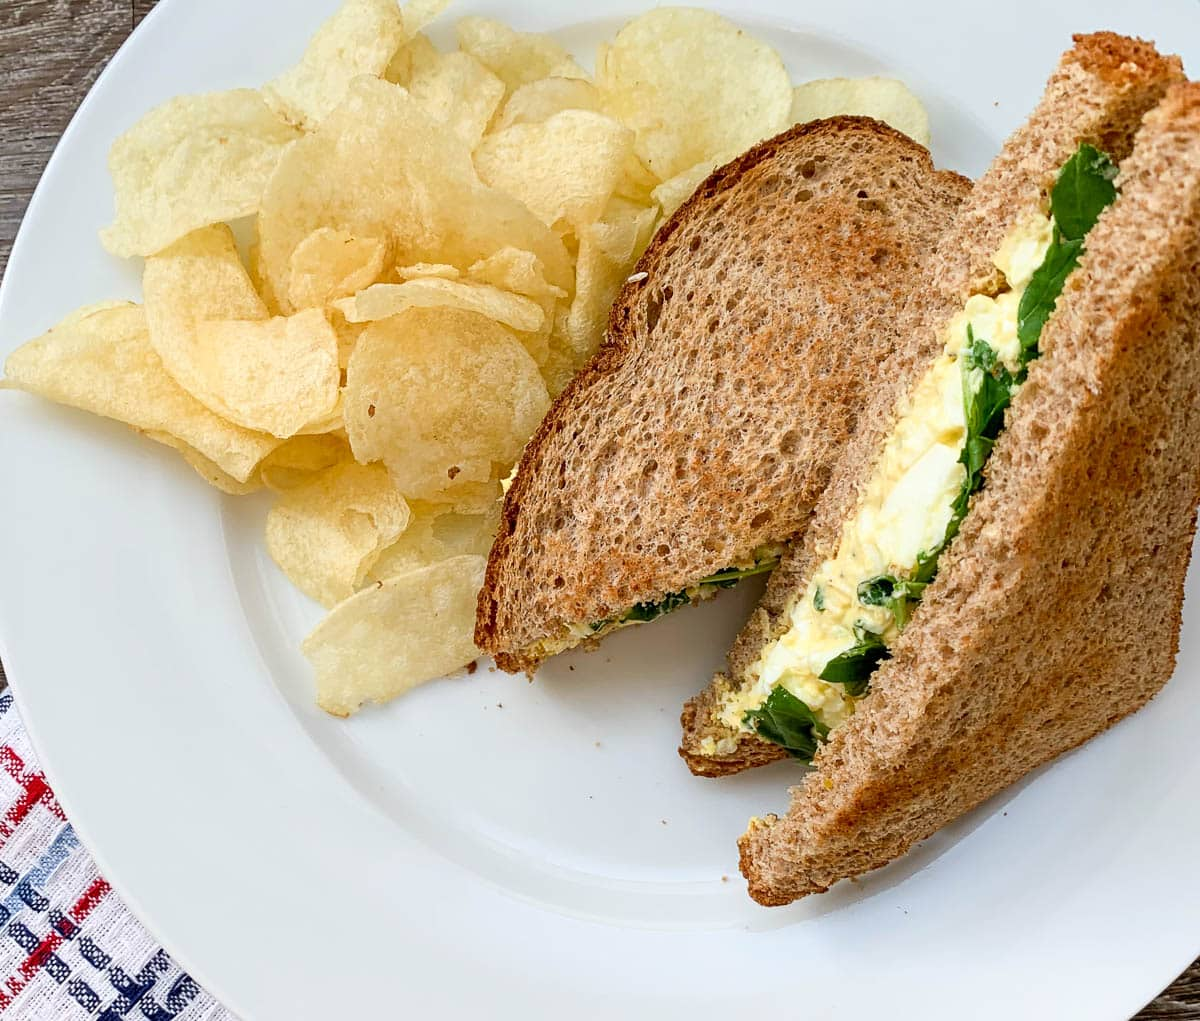 starbucks egg salad sandwich with chips